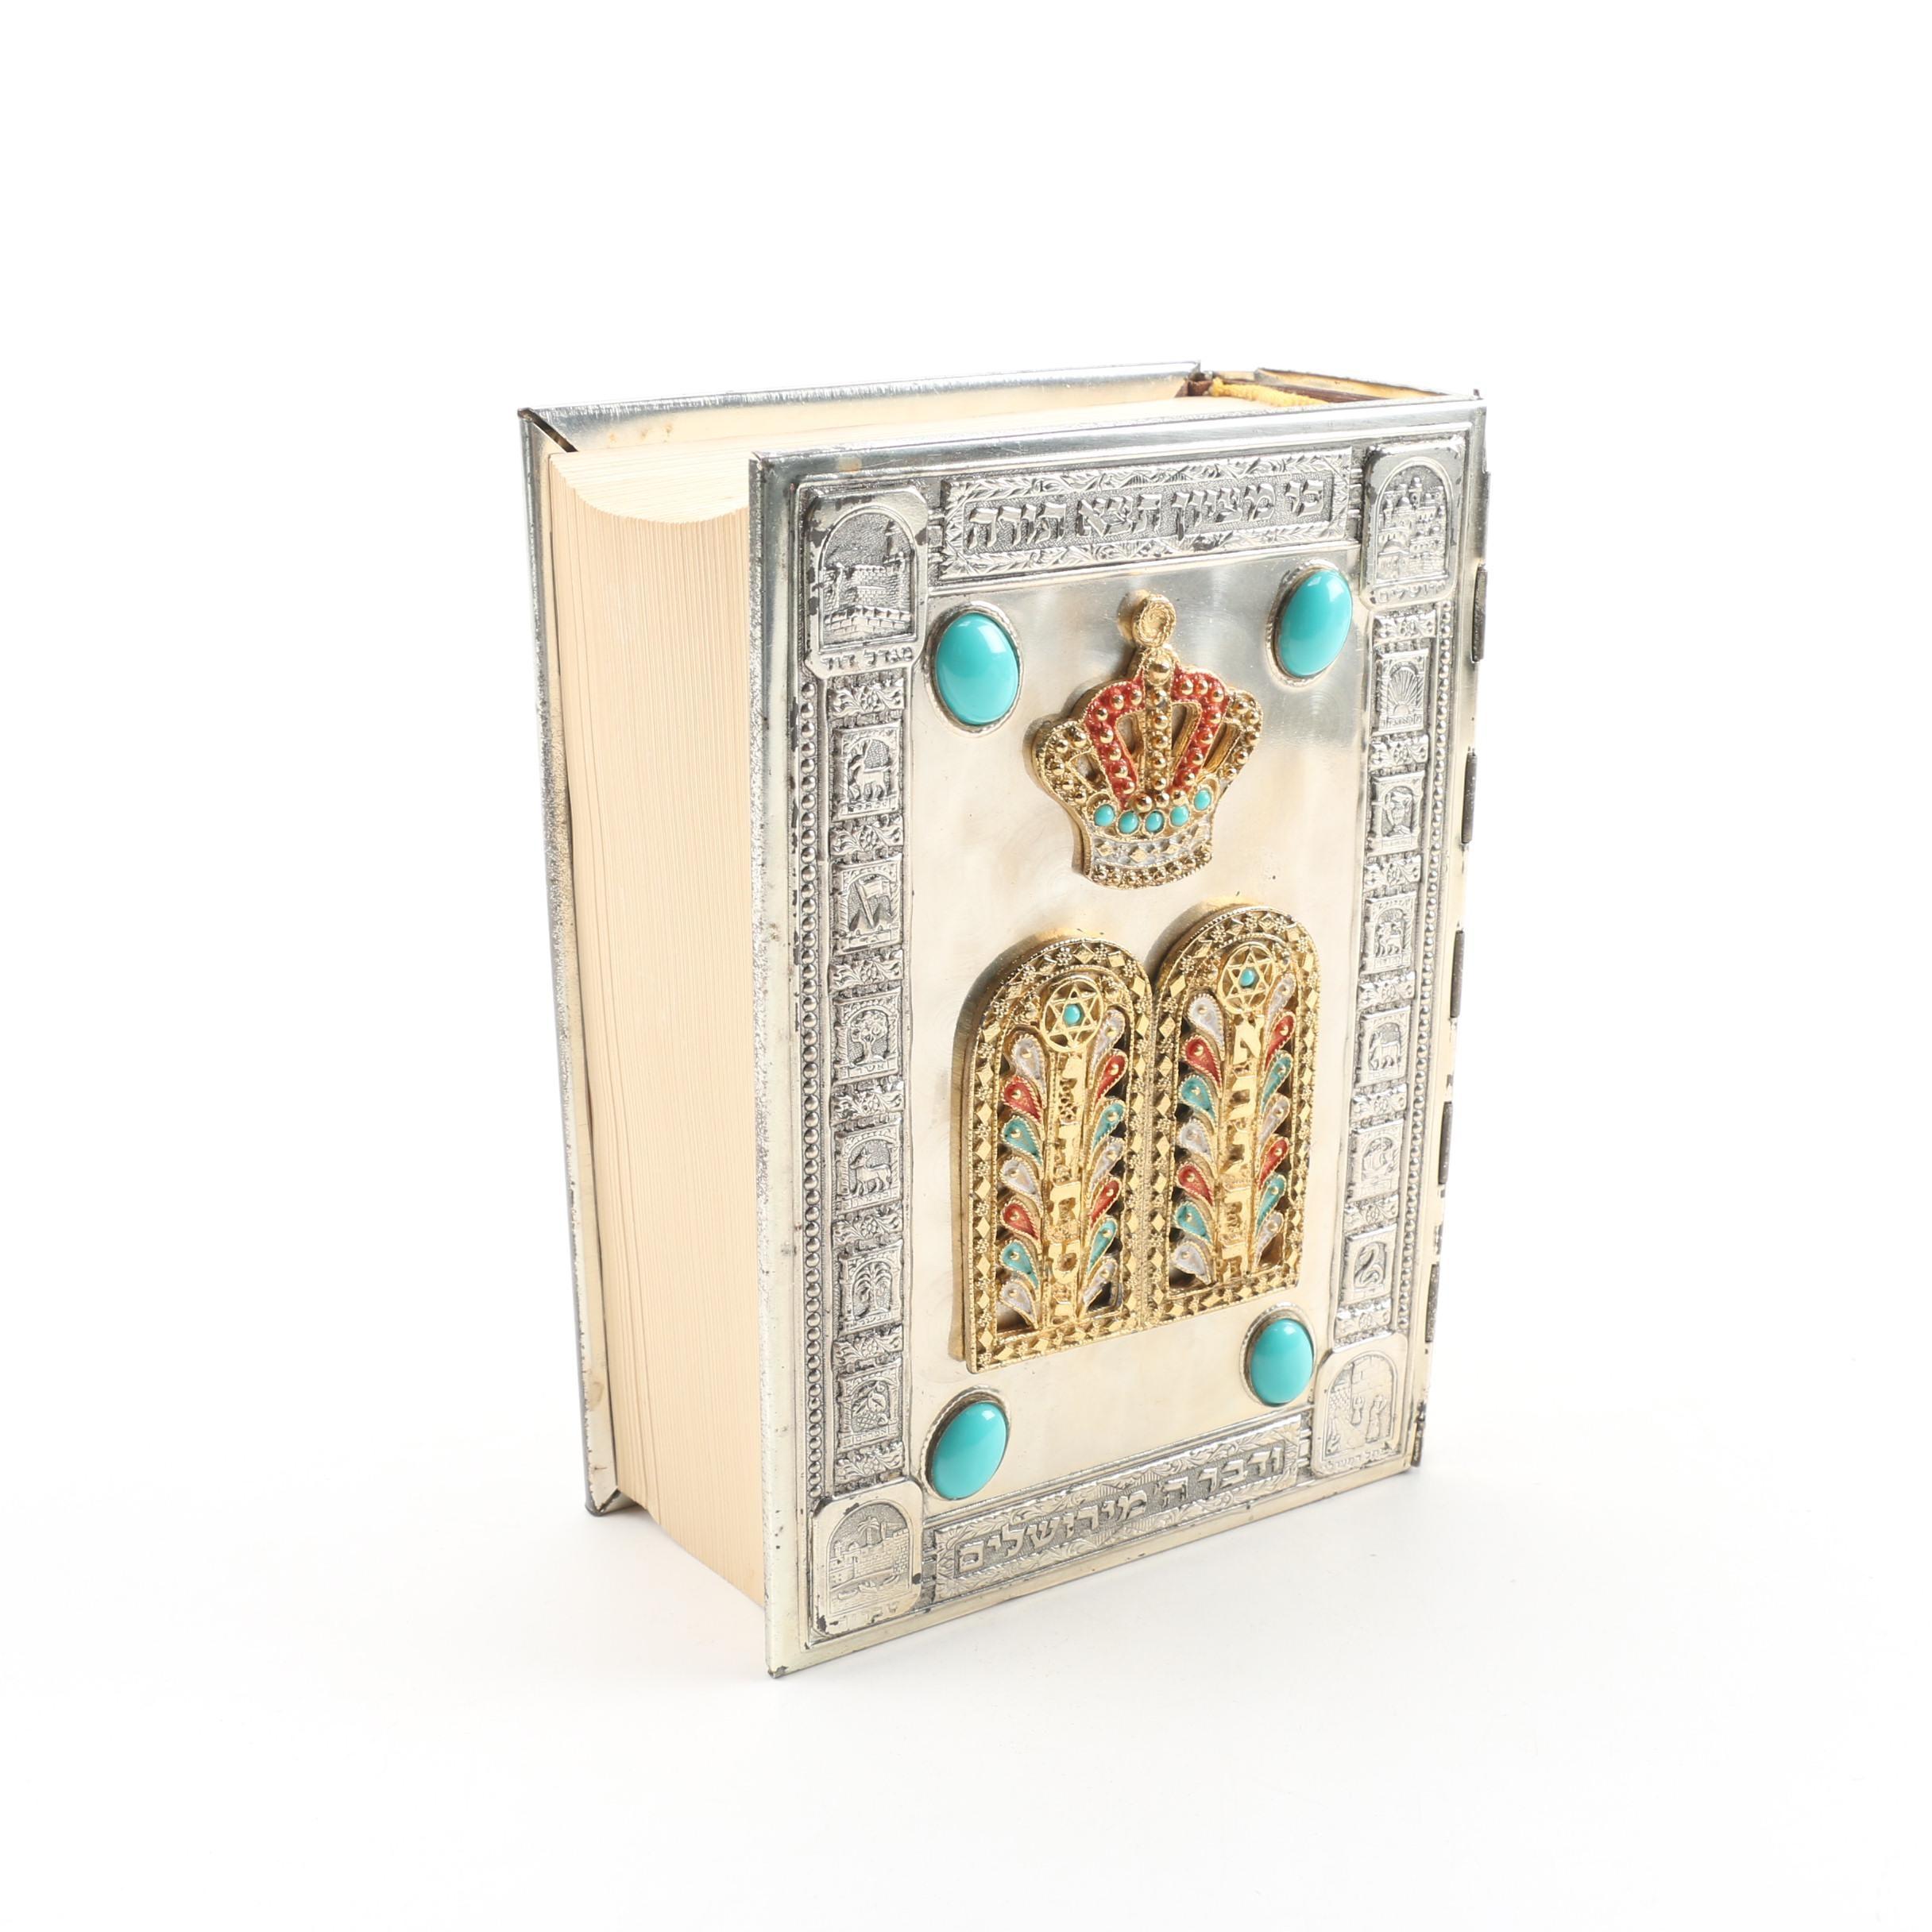 Hebrew-English Jewish Bible with Metal Binding, 1972